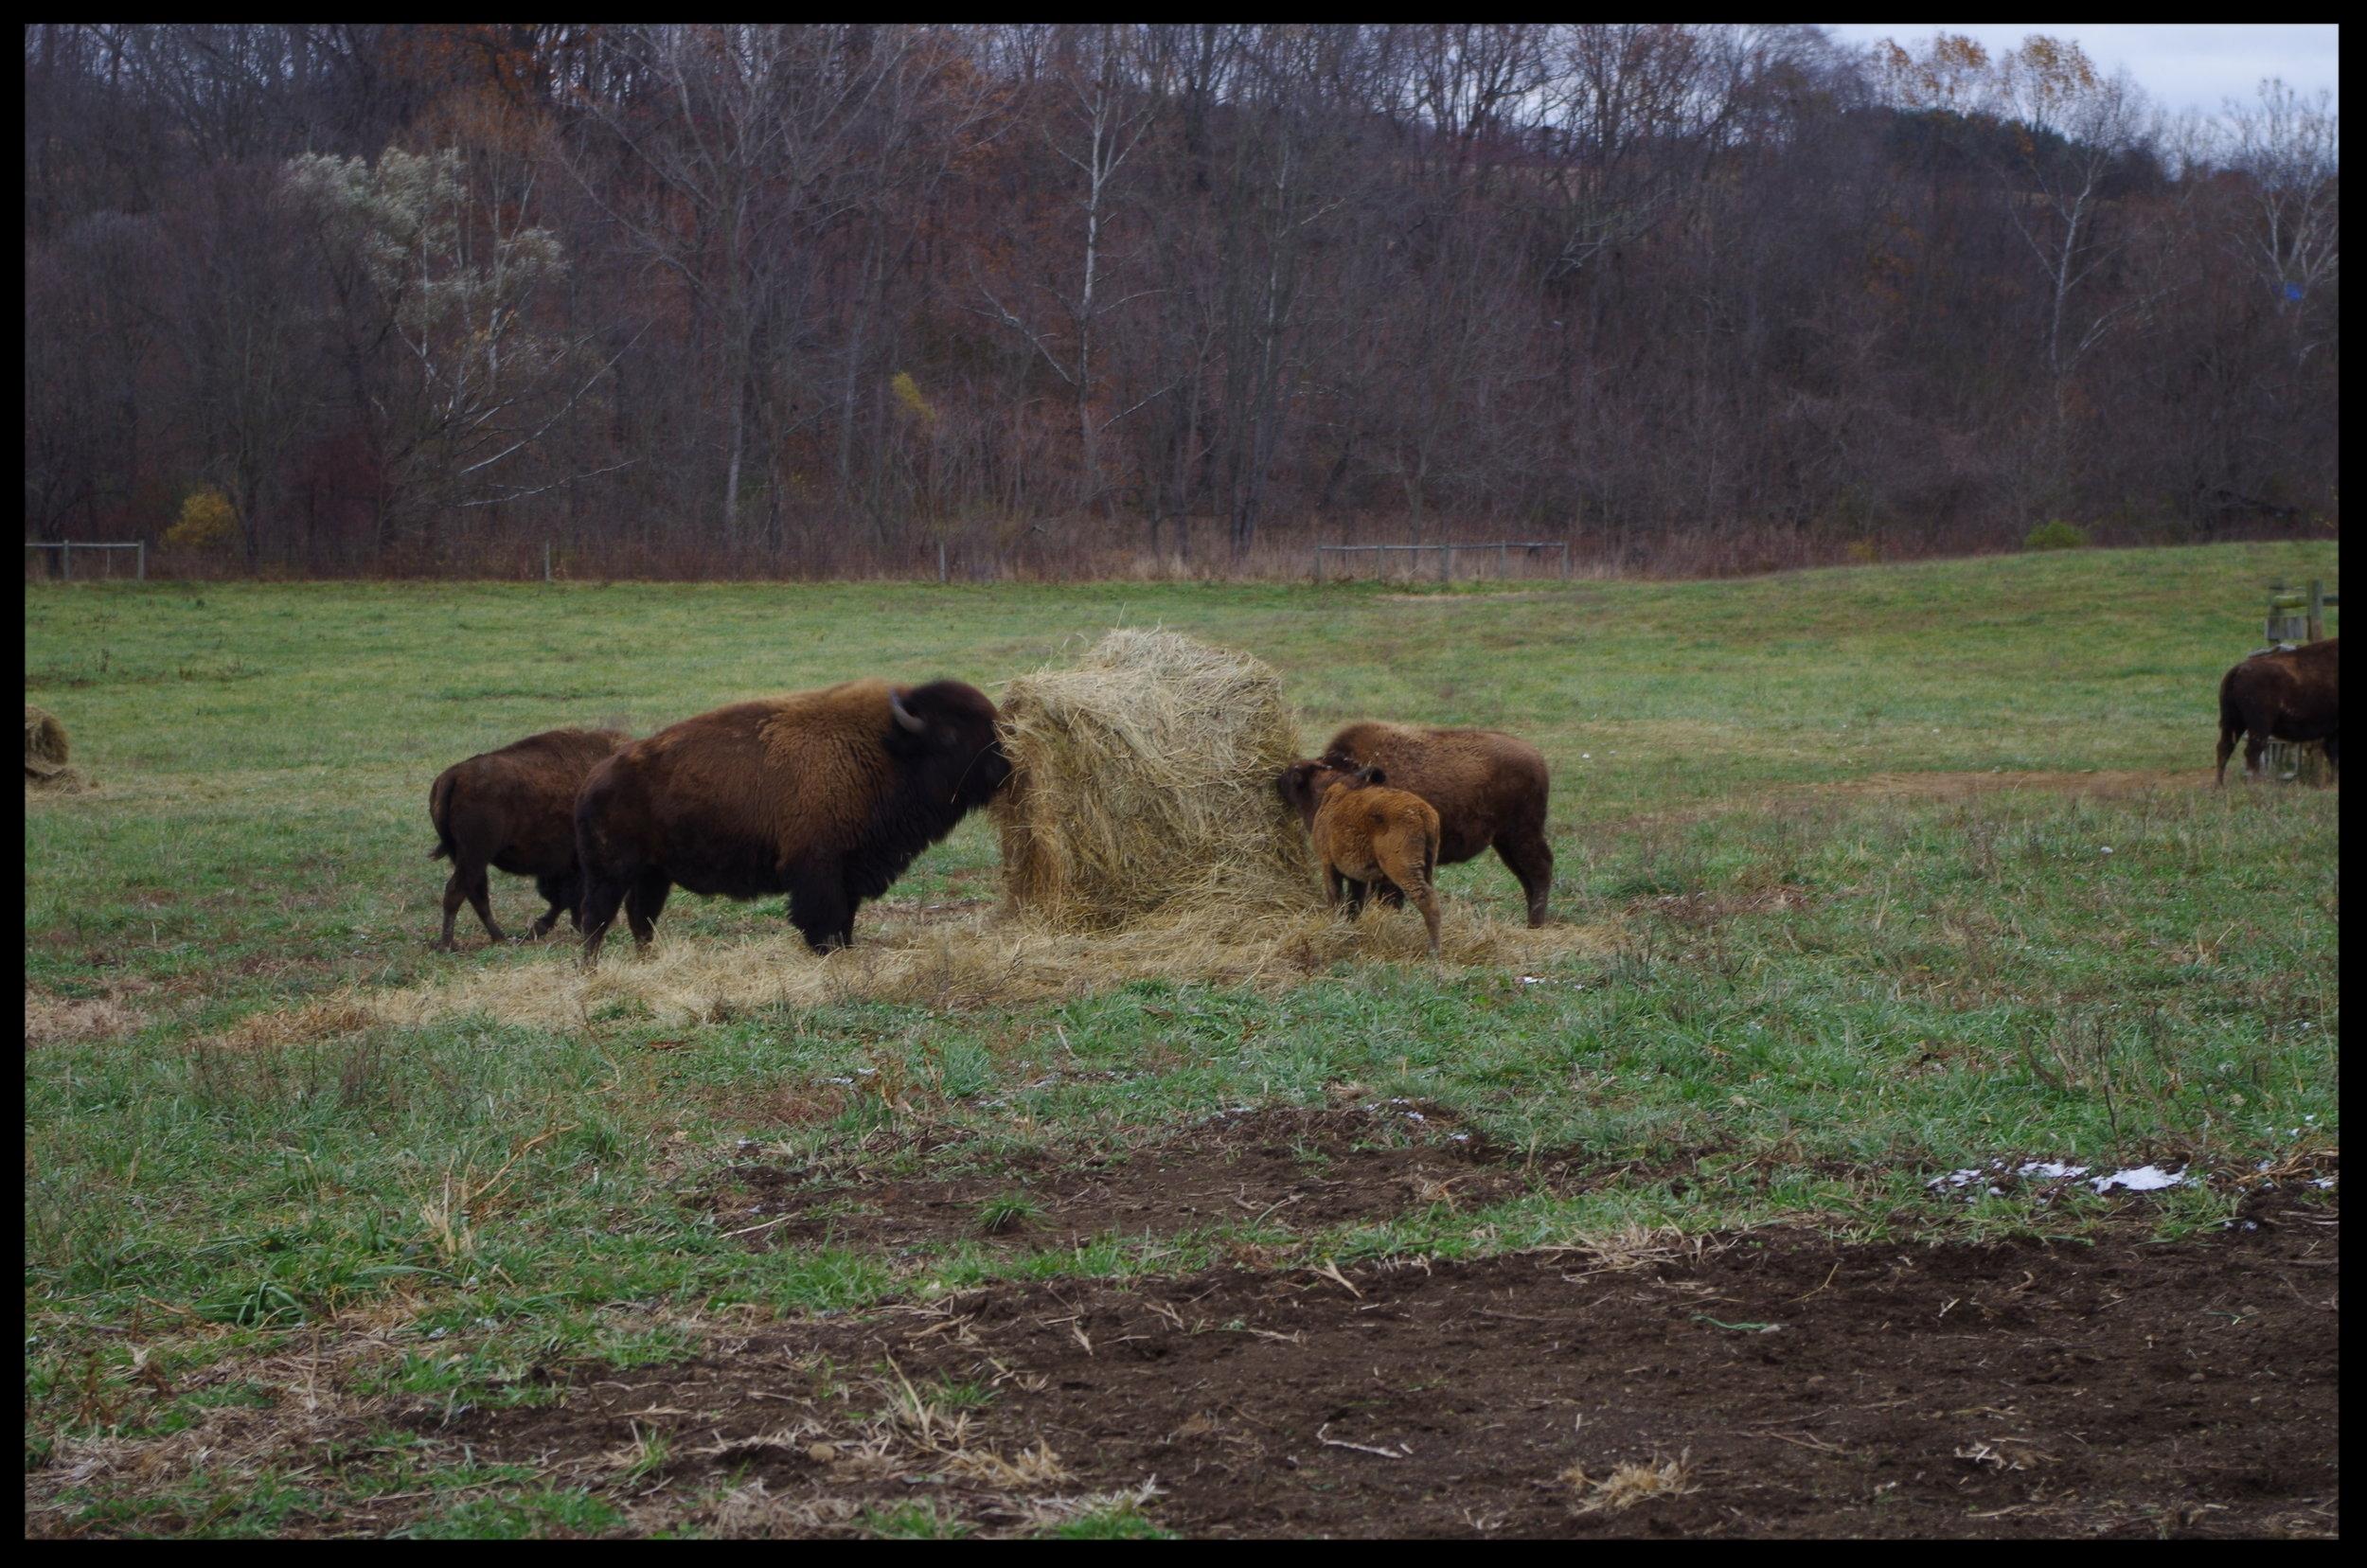 Bison feeding in the field 3.JPG